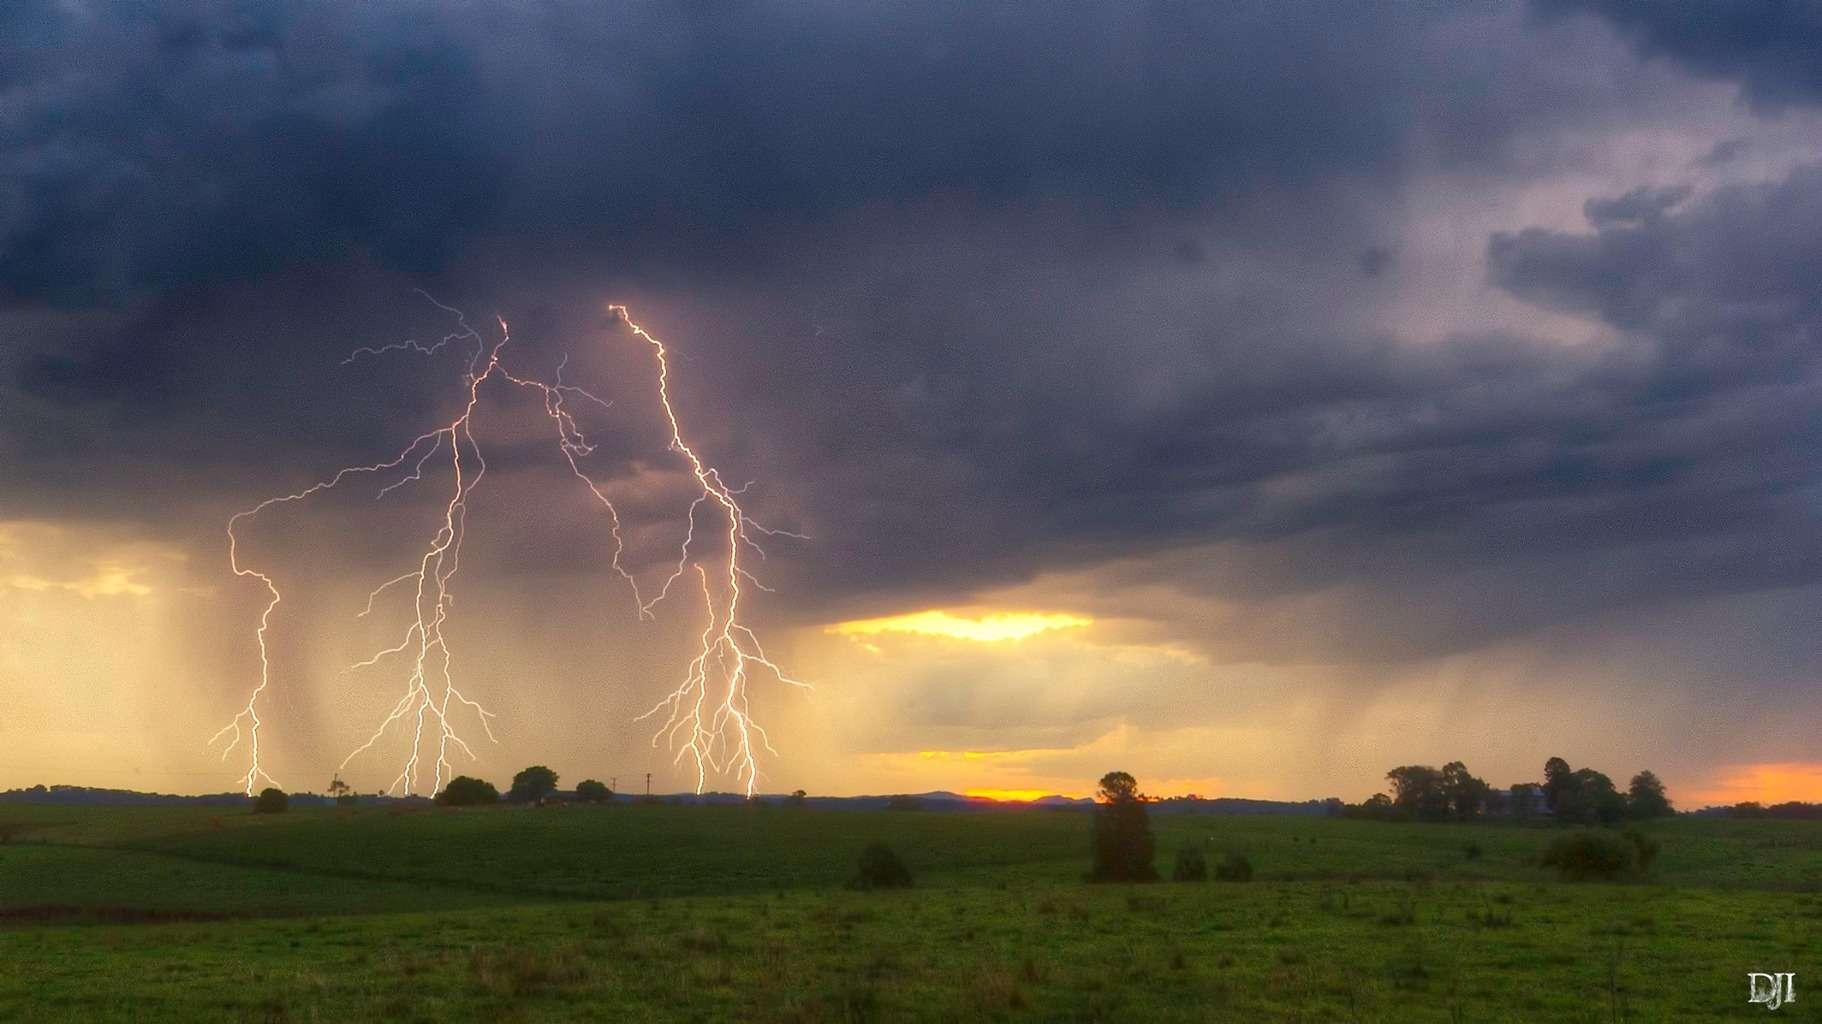 Sunset storm from Lochinvar NSW Australia.